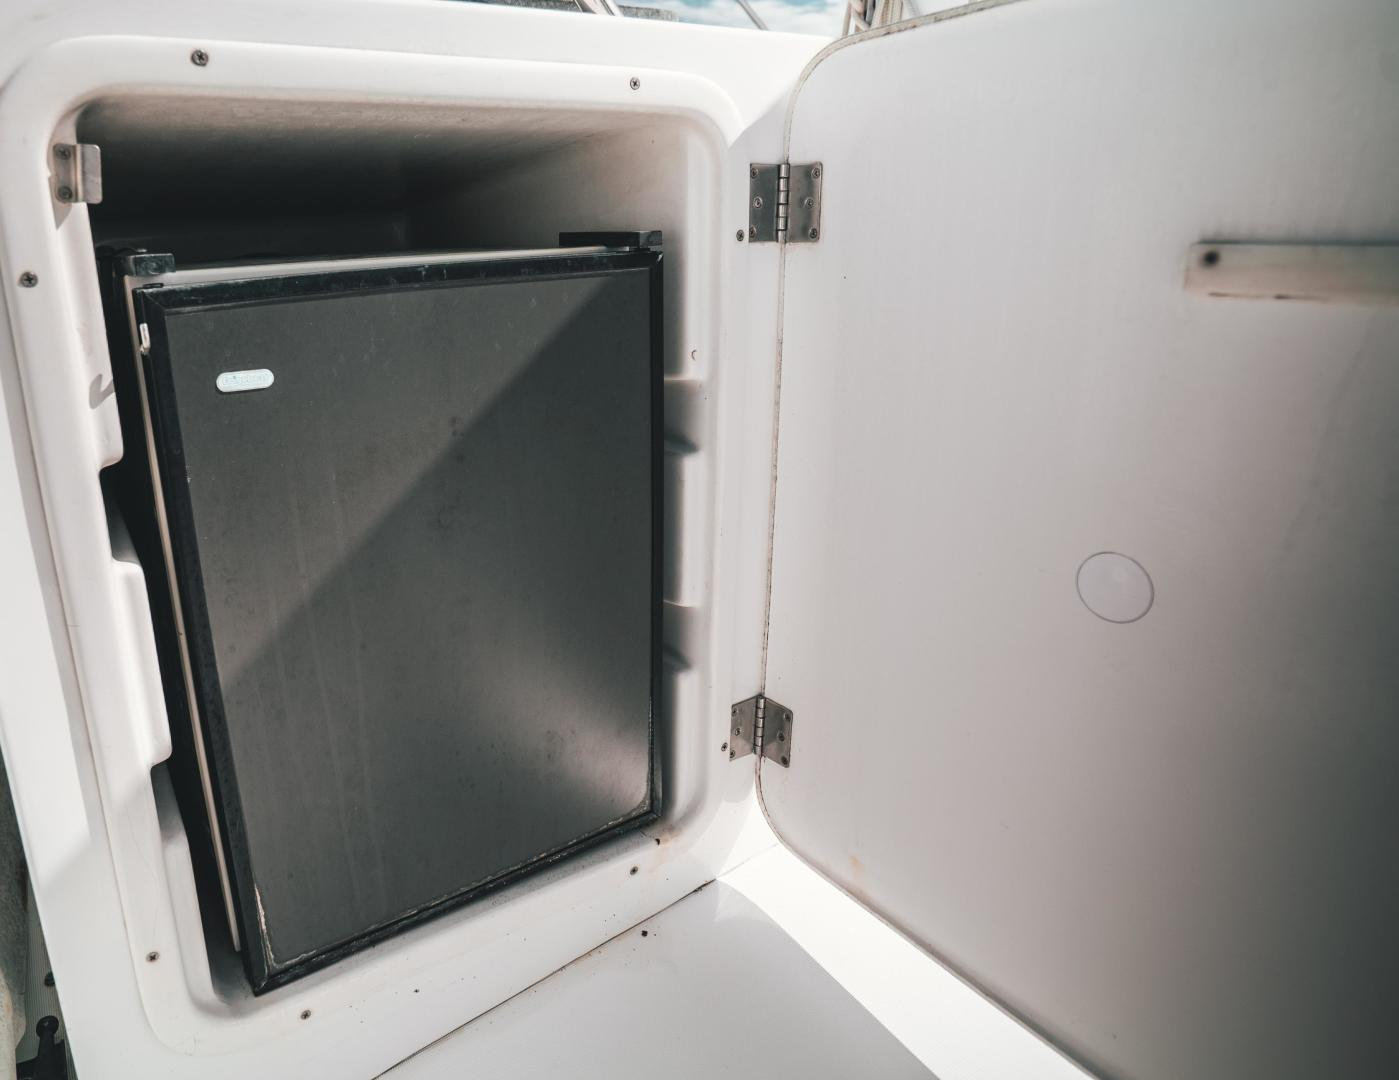 Beneteau-Swift Trawler 2008-Amadeus Acapulco-Mexico-1487046 | Thumbnail